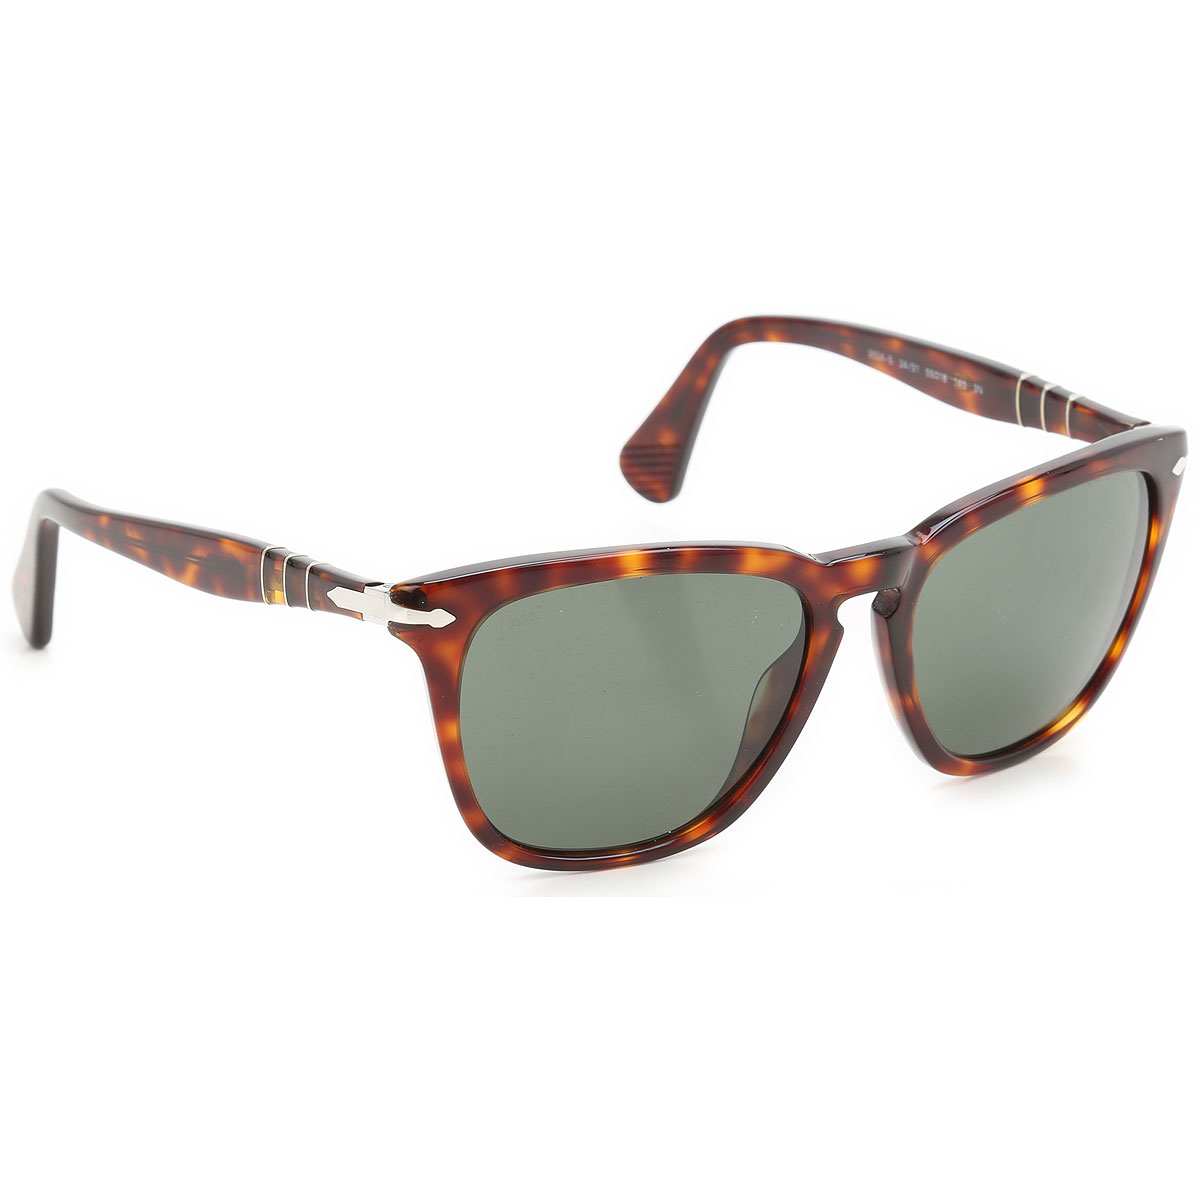 d6bbb92707 Persol. Sunglasses